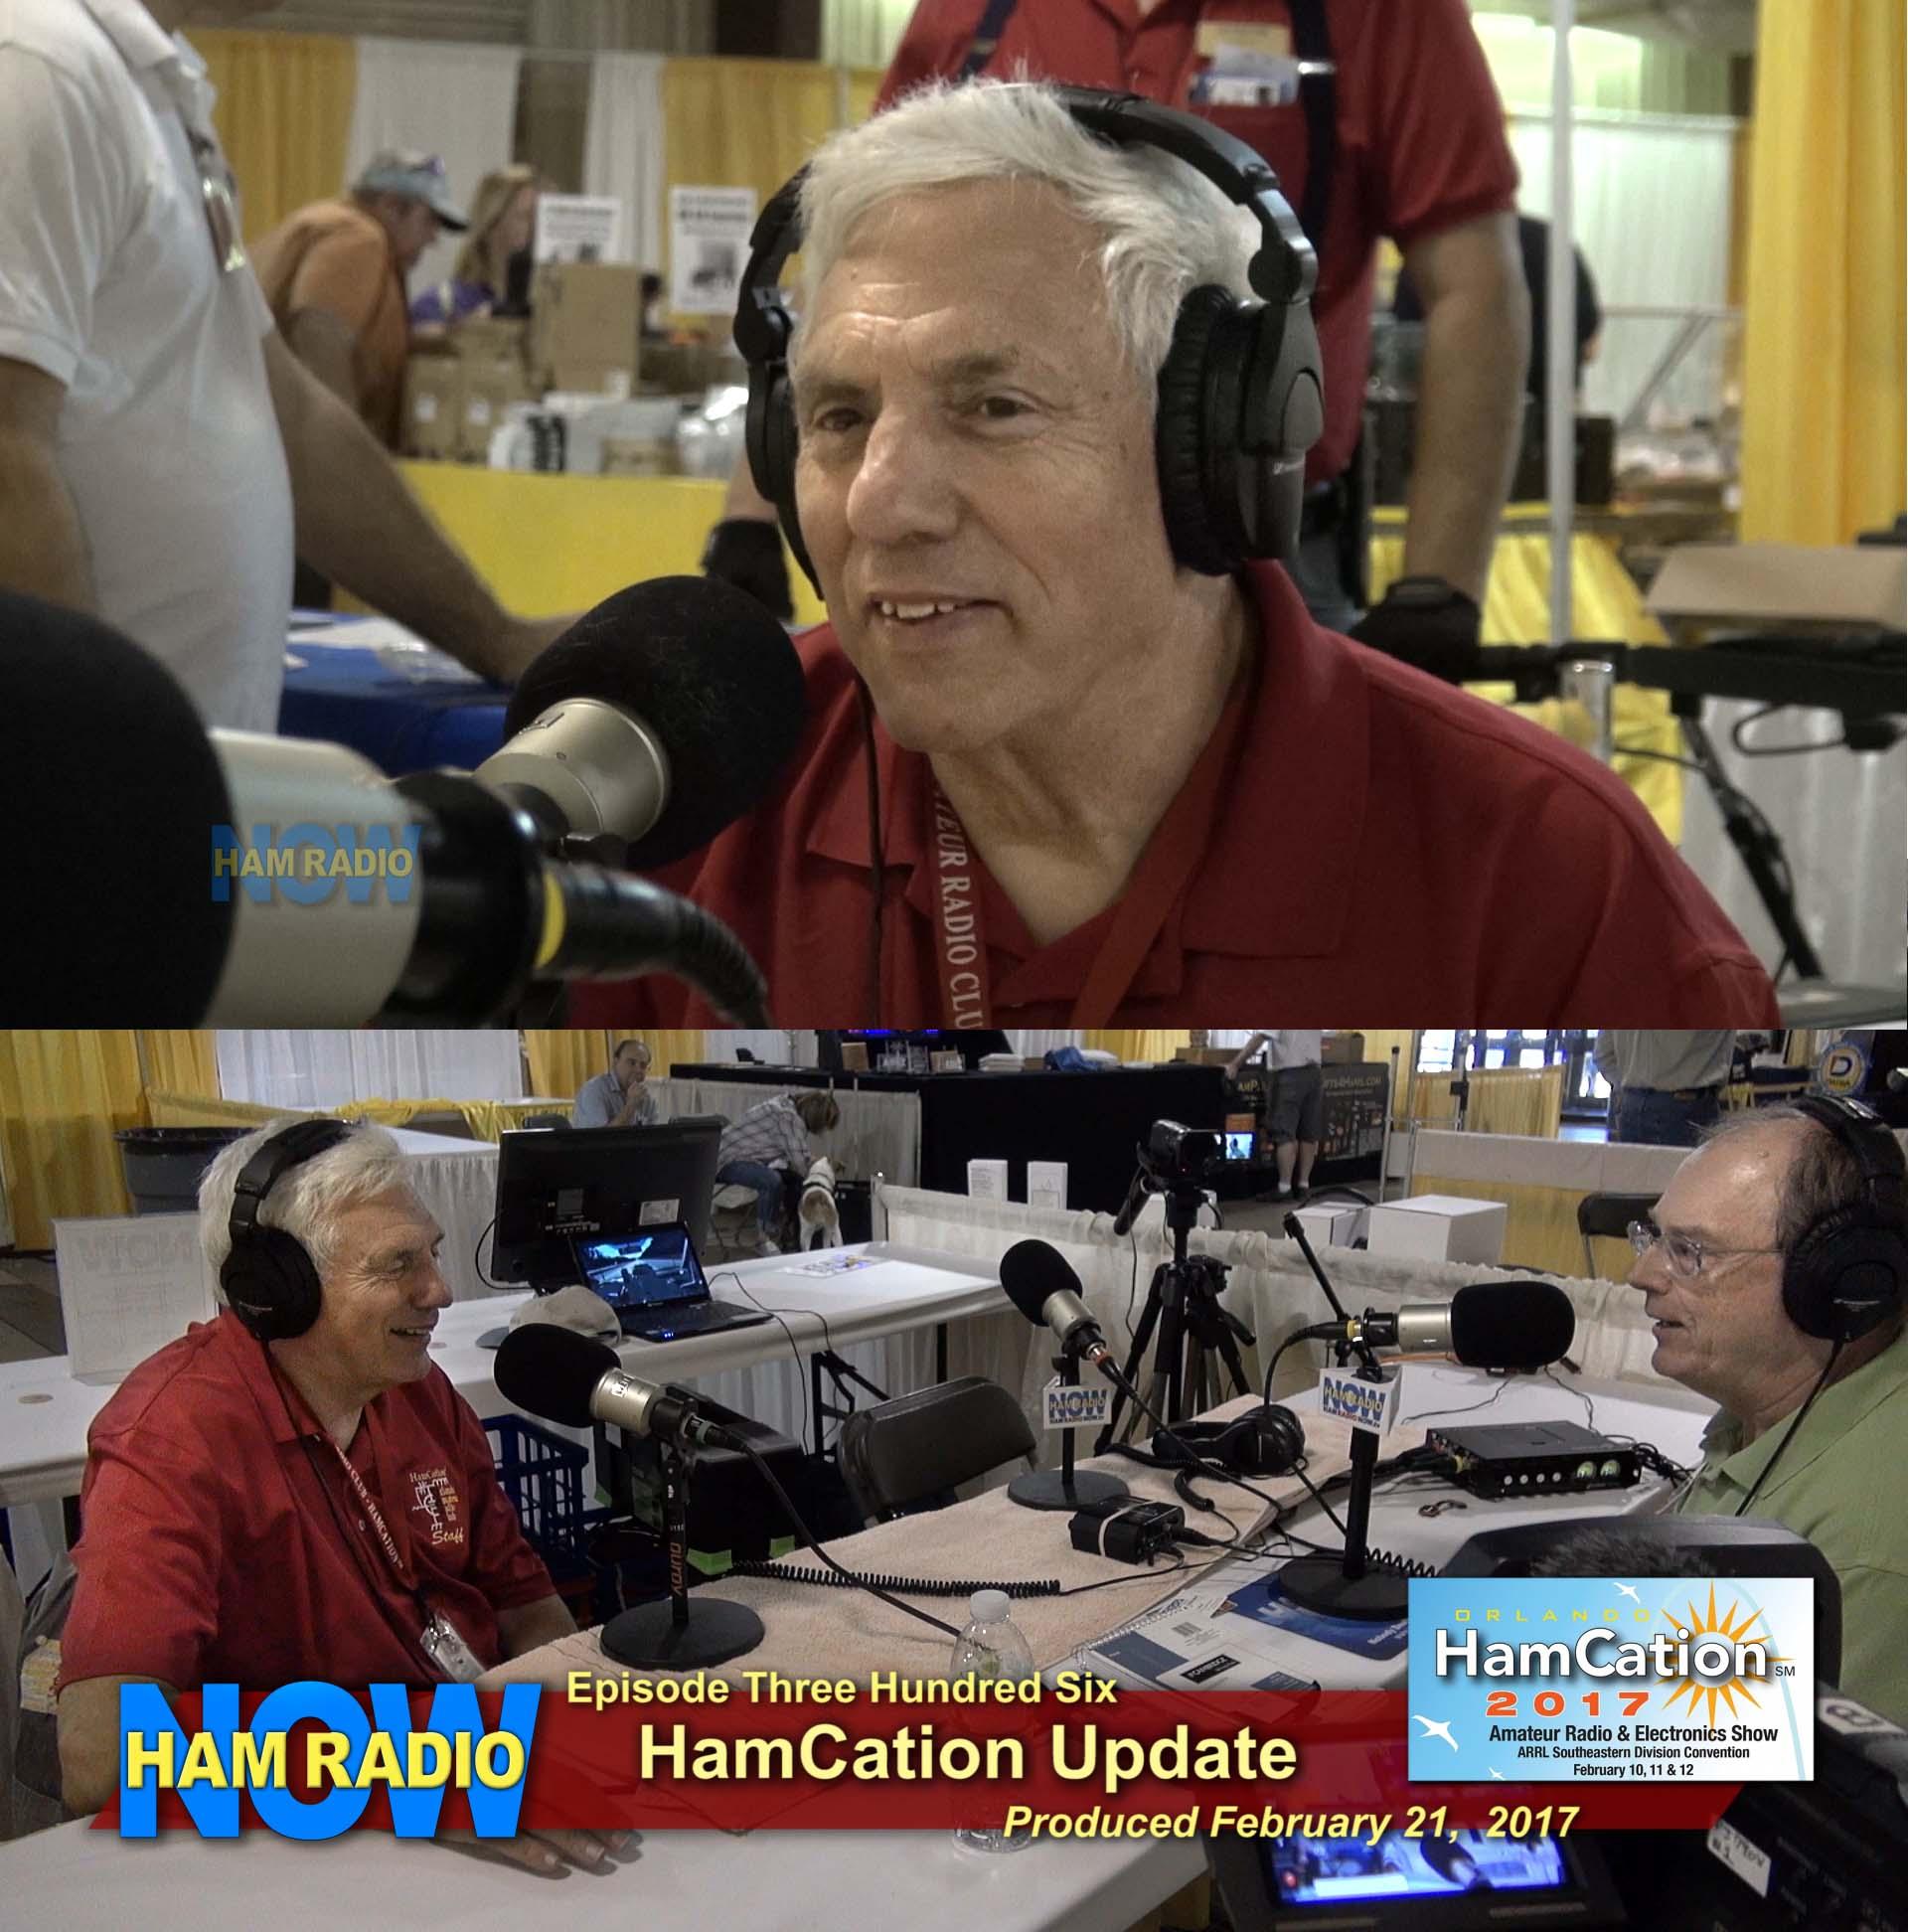 HRN 306 HamCation Update POSTER SQUARE.jpg